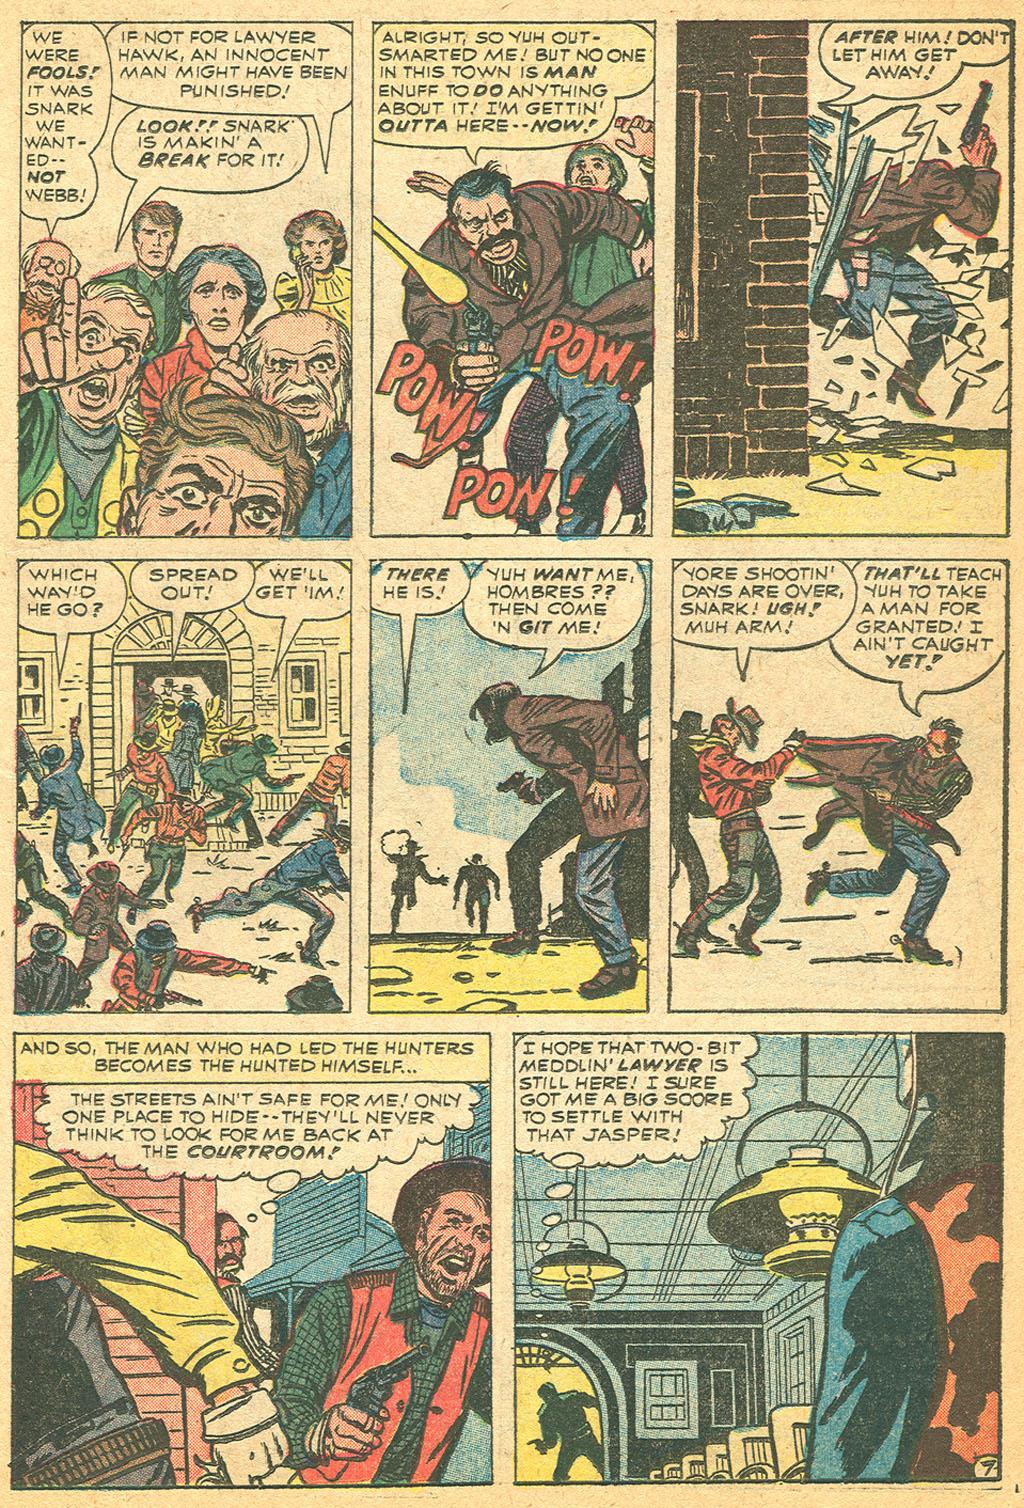 Read online Two-Gun Kid comic -  Issue #61 - 11